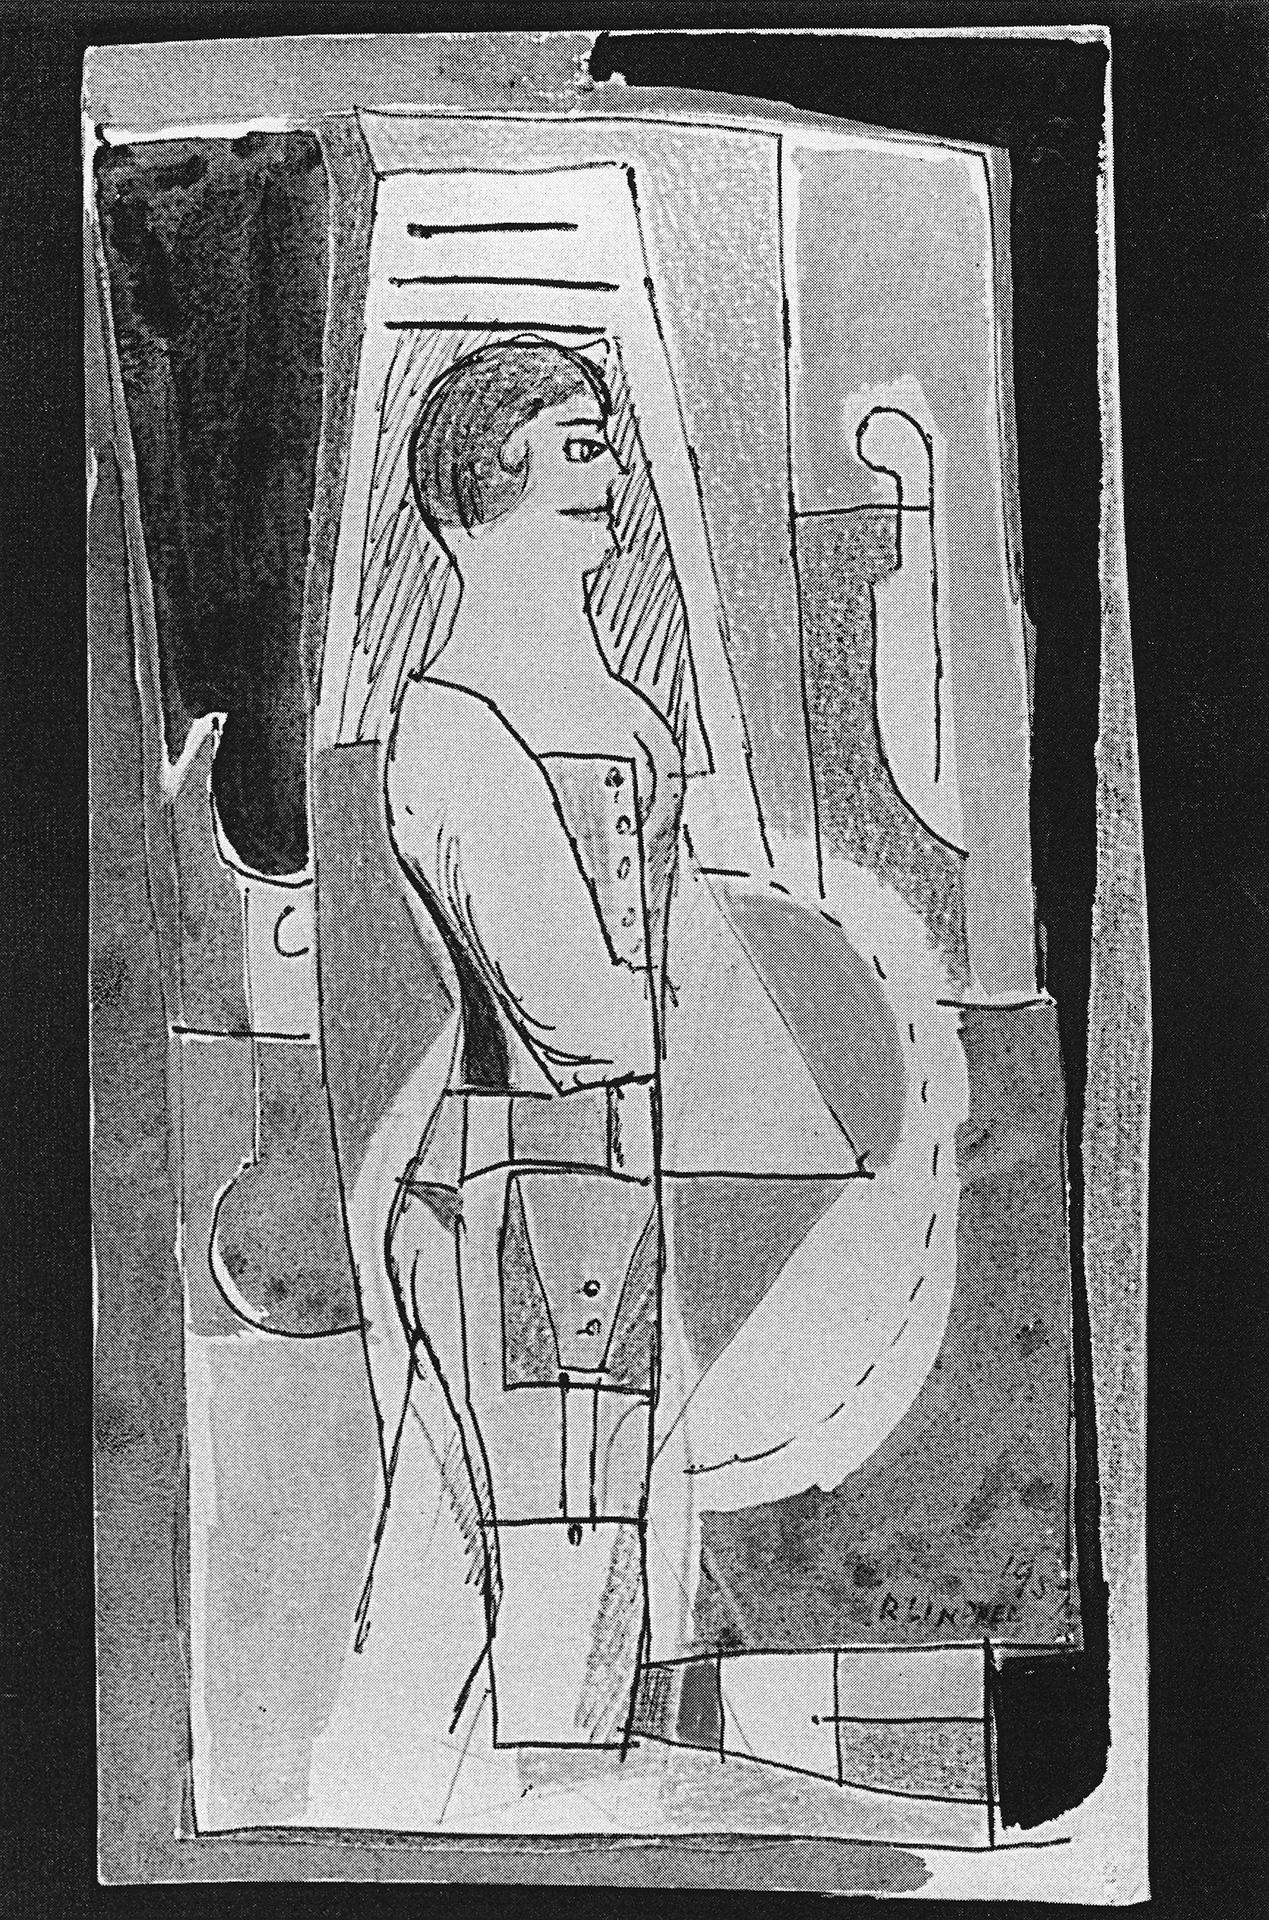 Woman in Corset, 1957